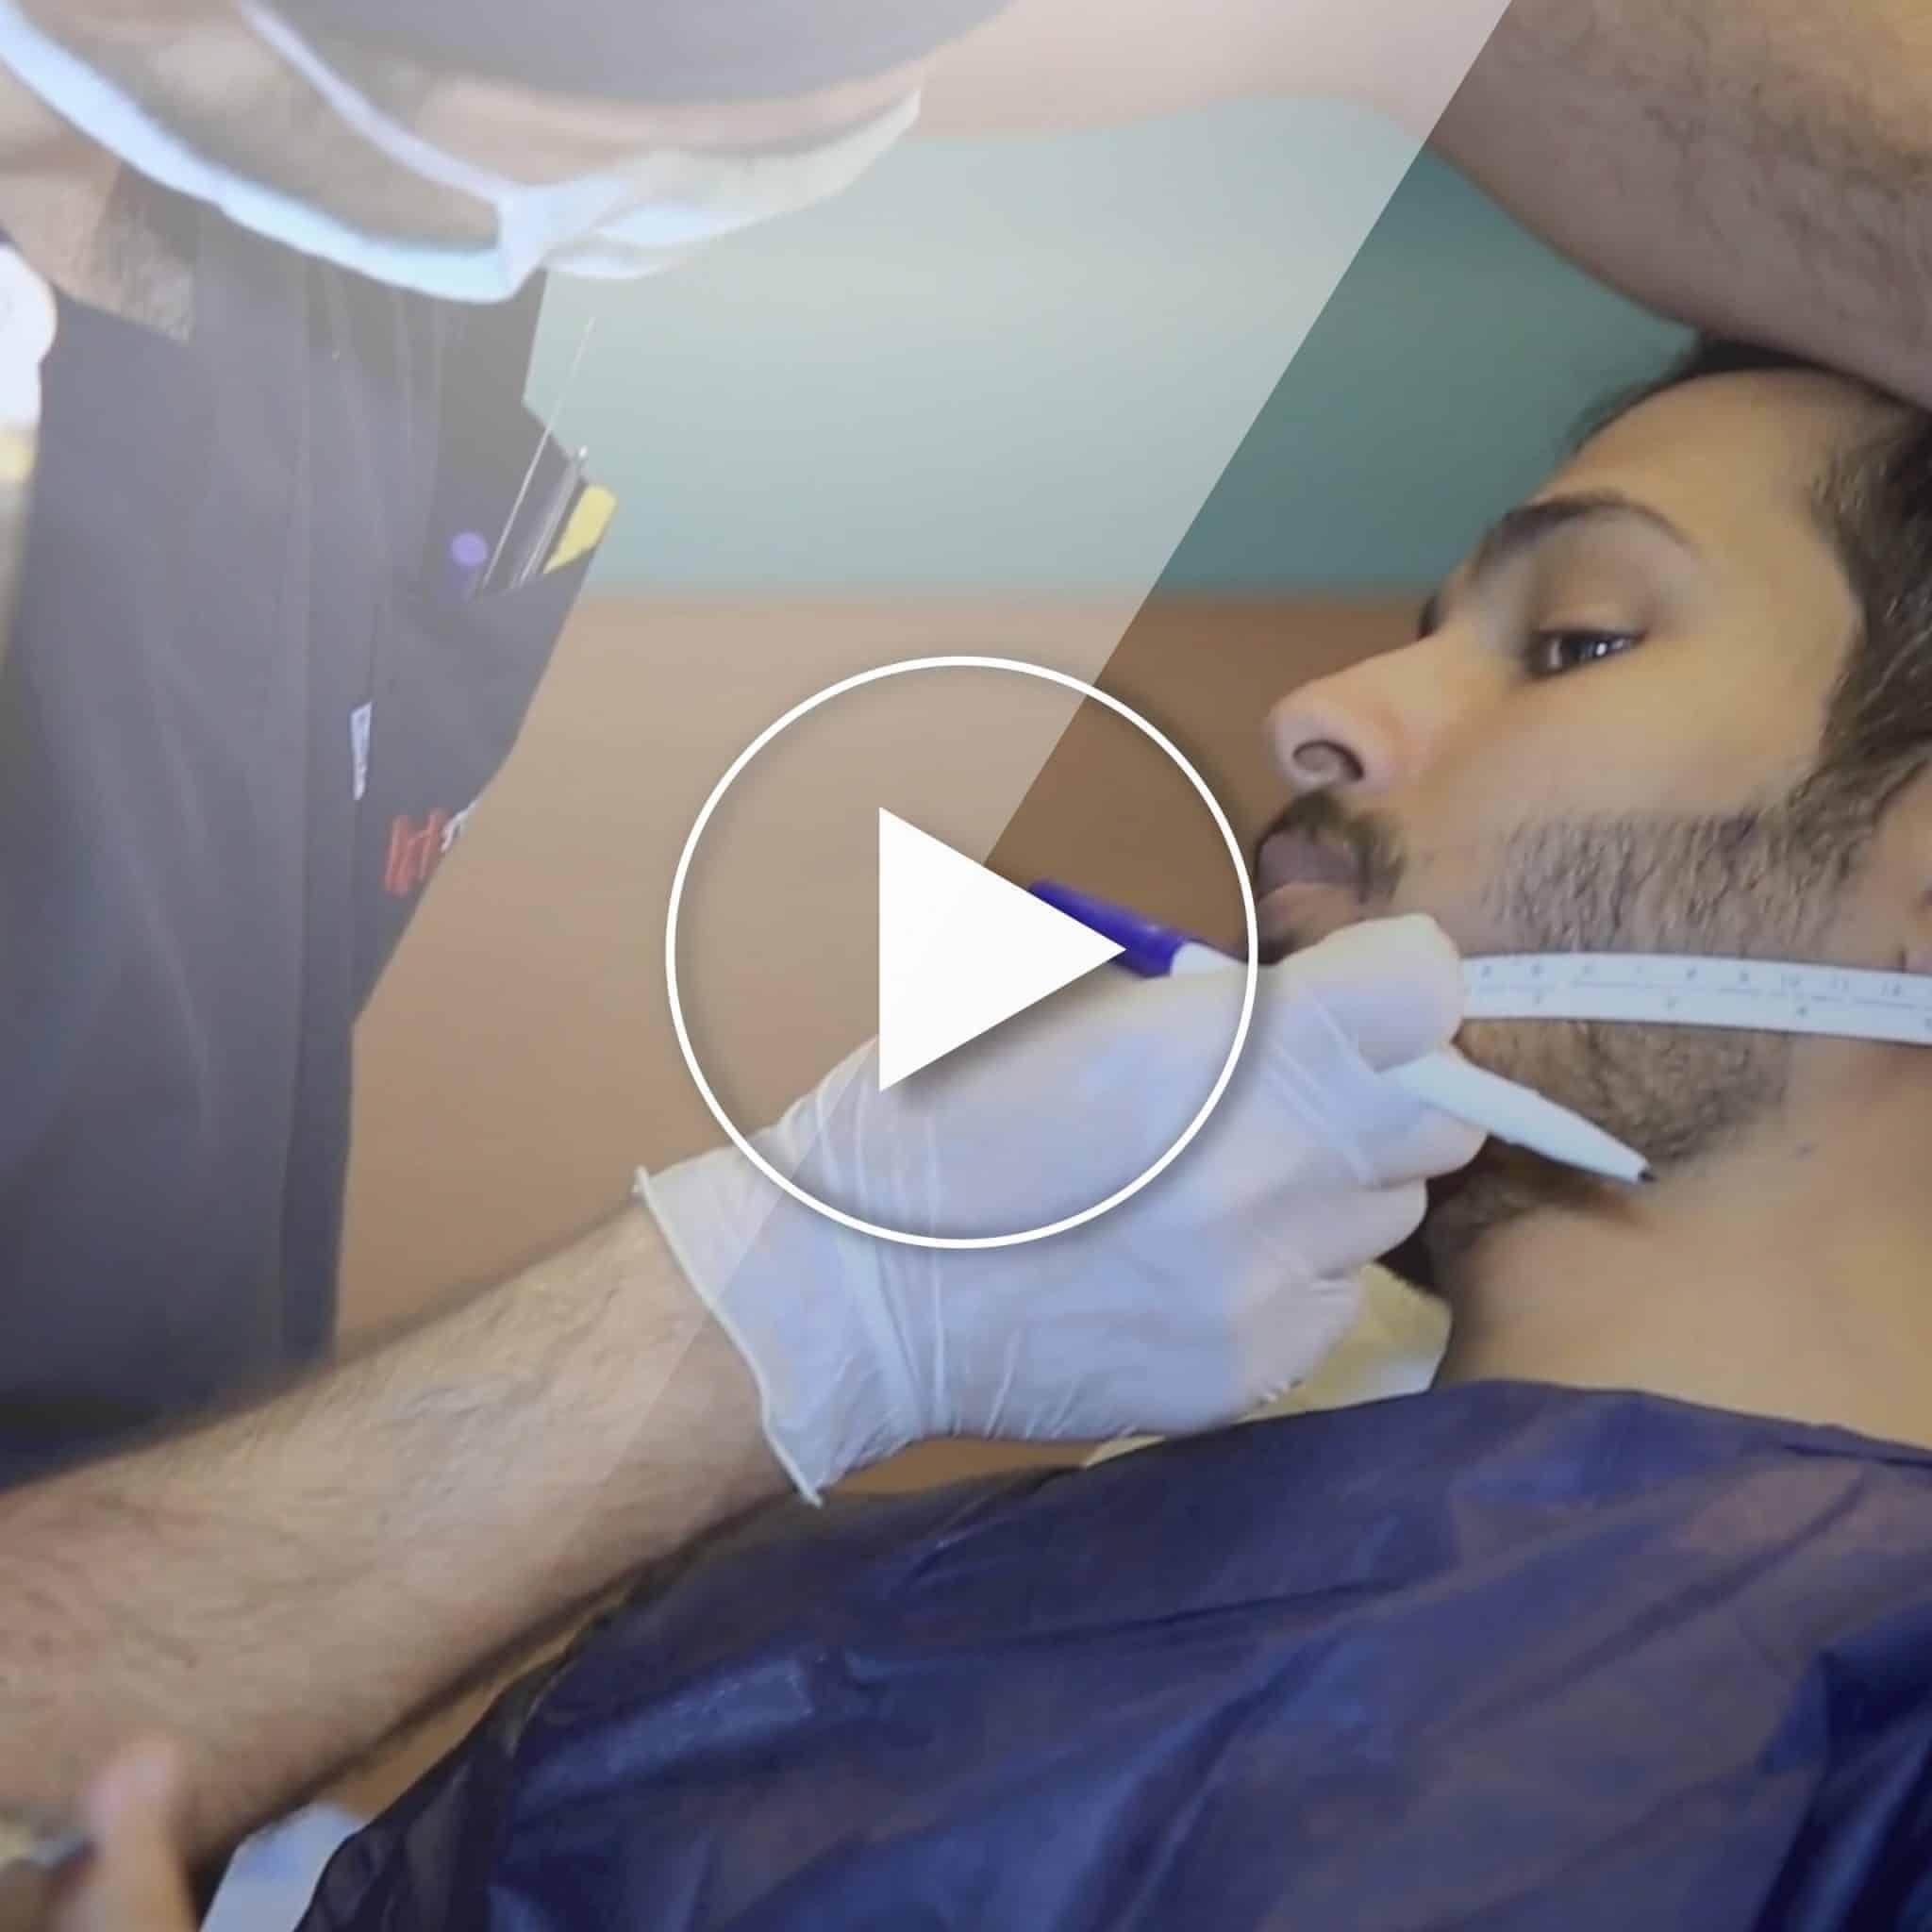 Beard and Mustache Transplantation in Turkey, Beard and mustache transplantation in Turkey